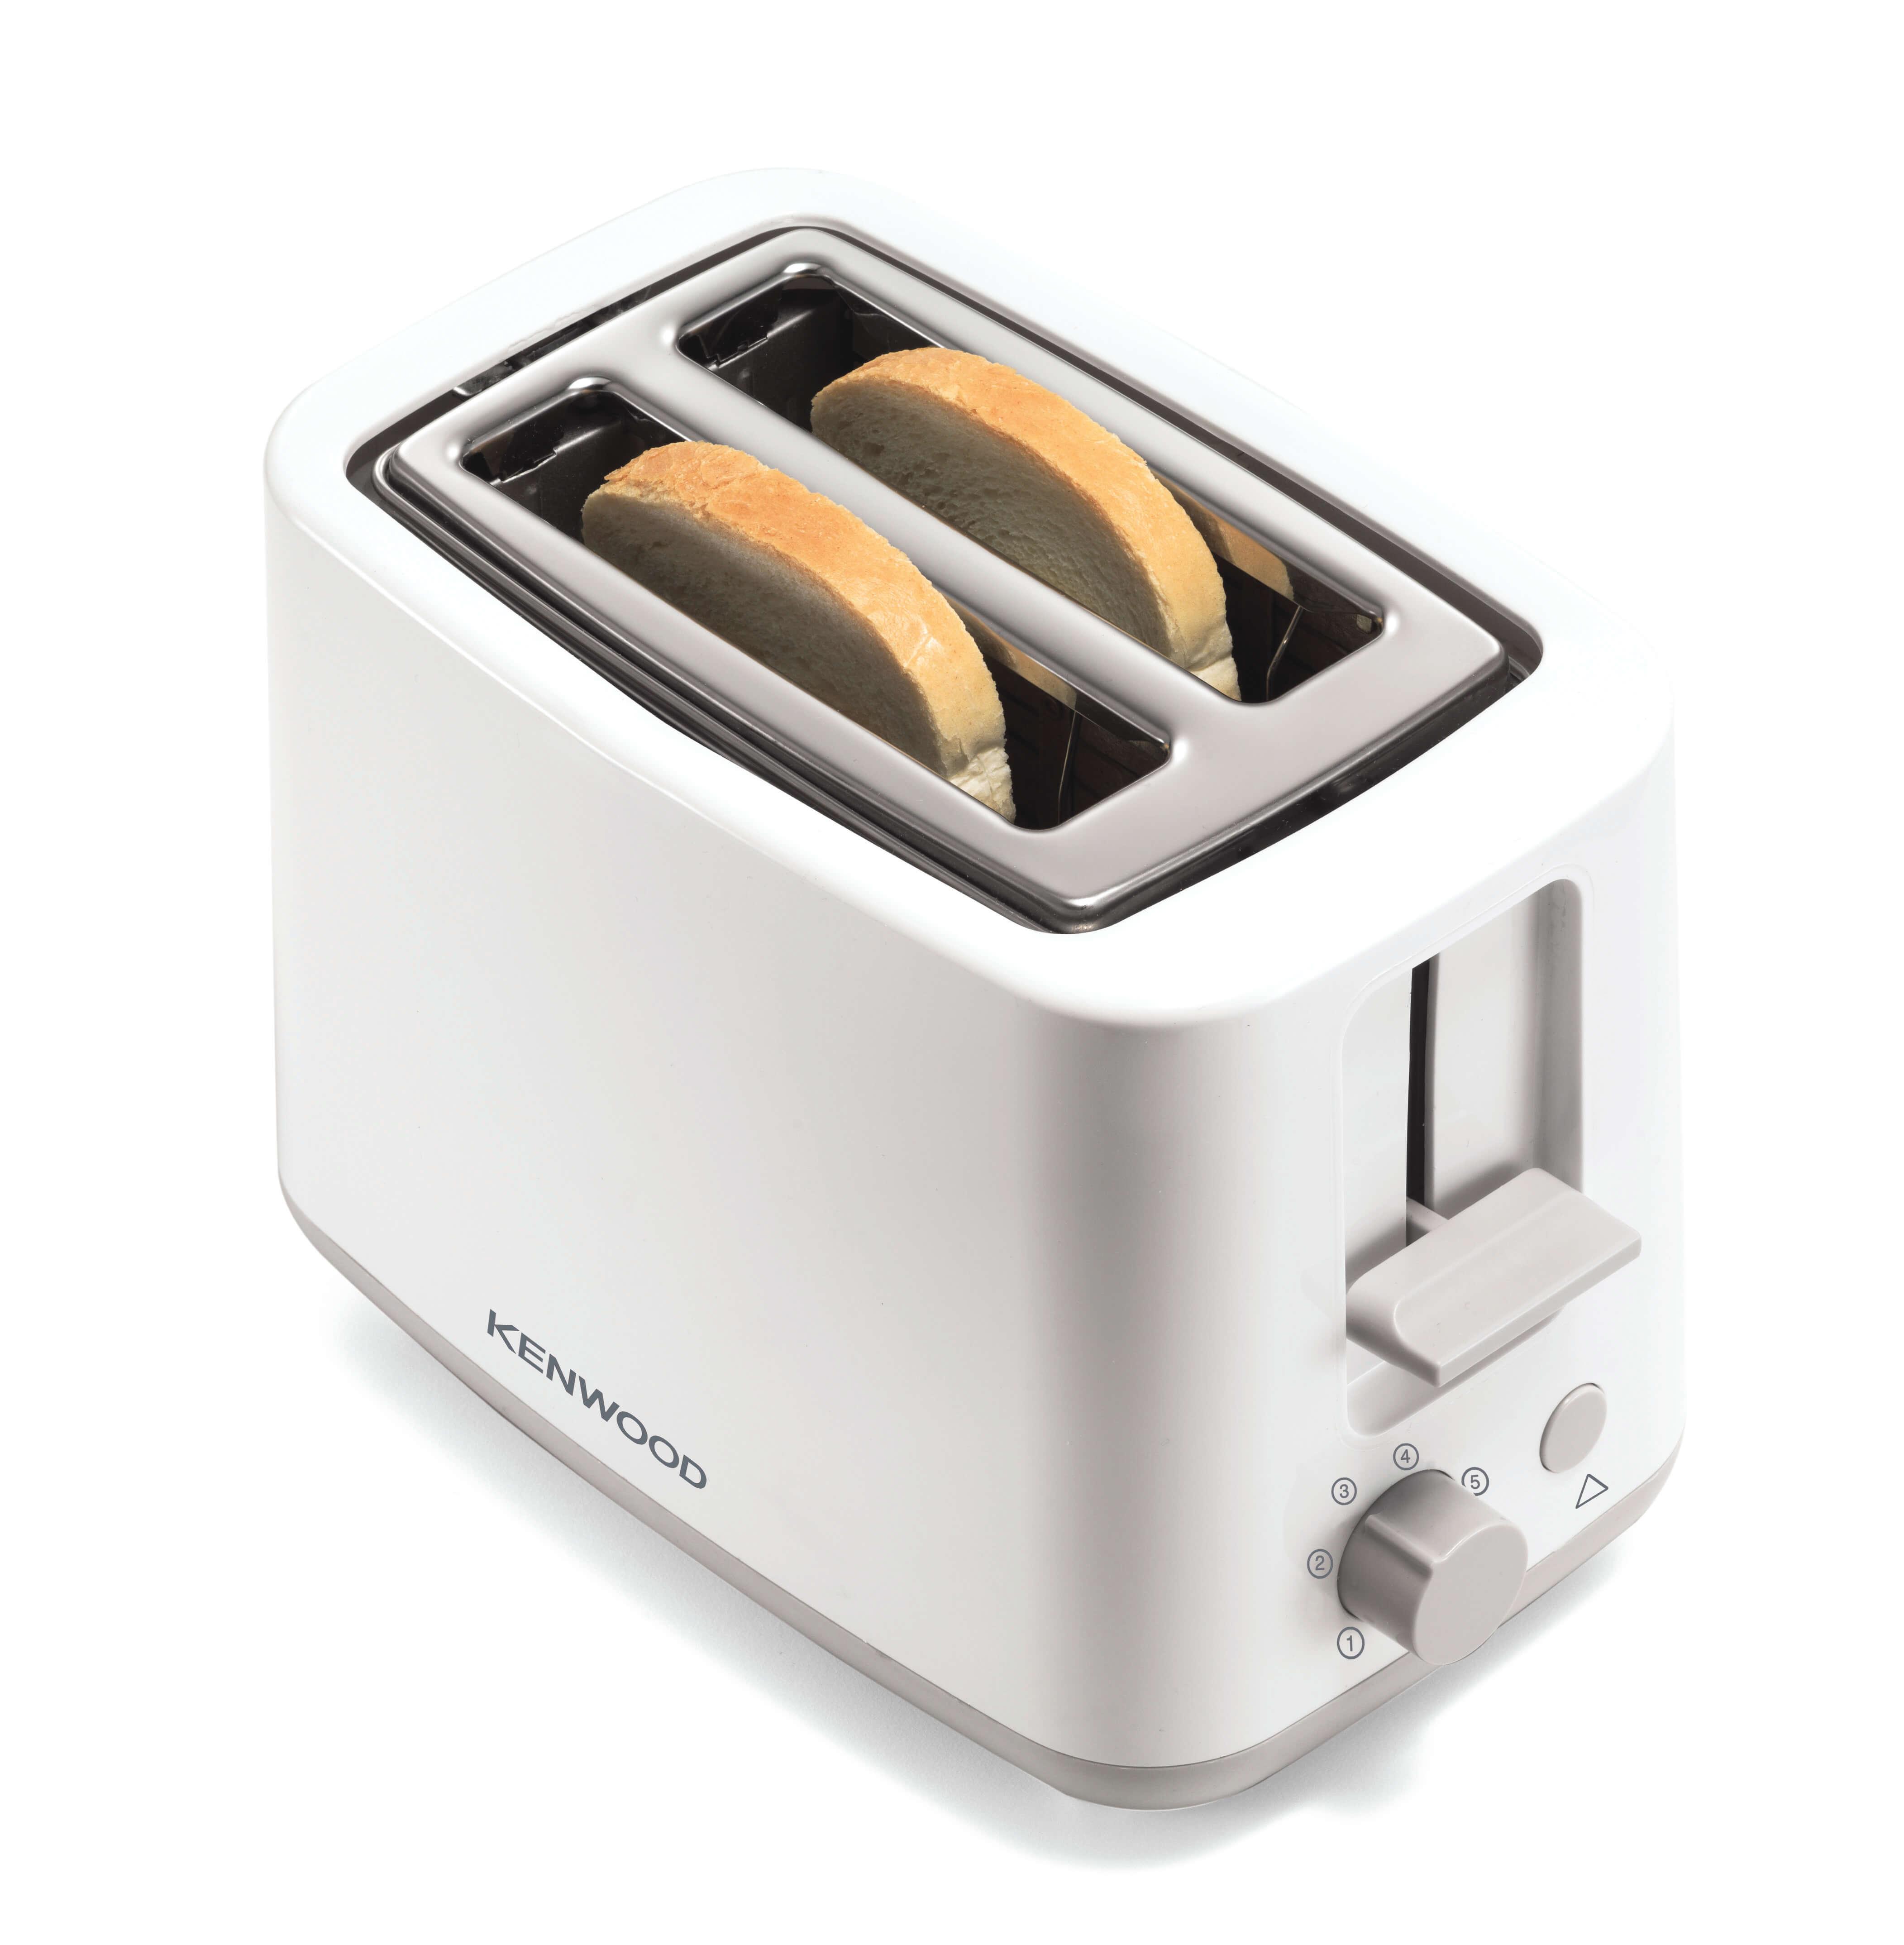 Kenwood Two Slice Toaster Scene Tcp-01 900w 02 Slice Capacity Wih Defrost Setting & Cancel Function Health Range